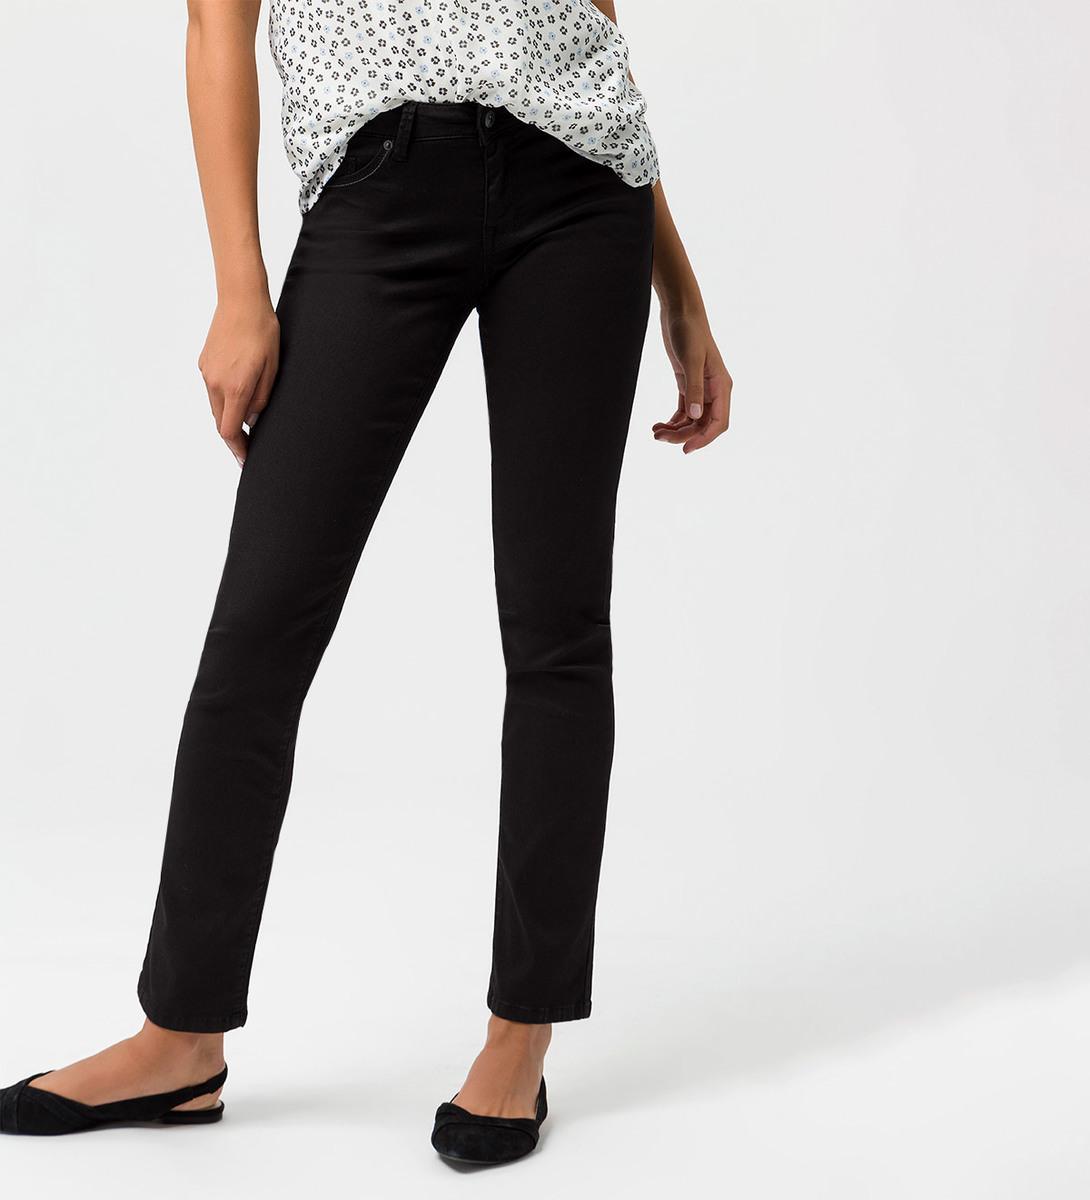 Jeans Slim Fit 32 inch in black